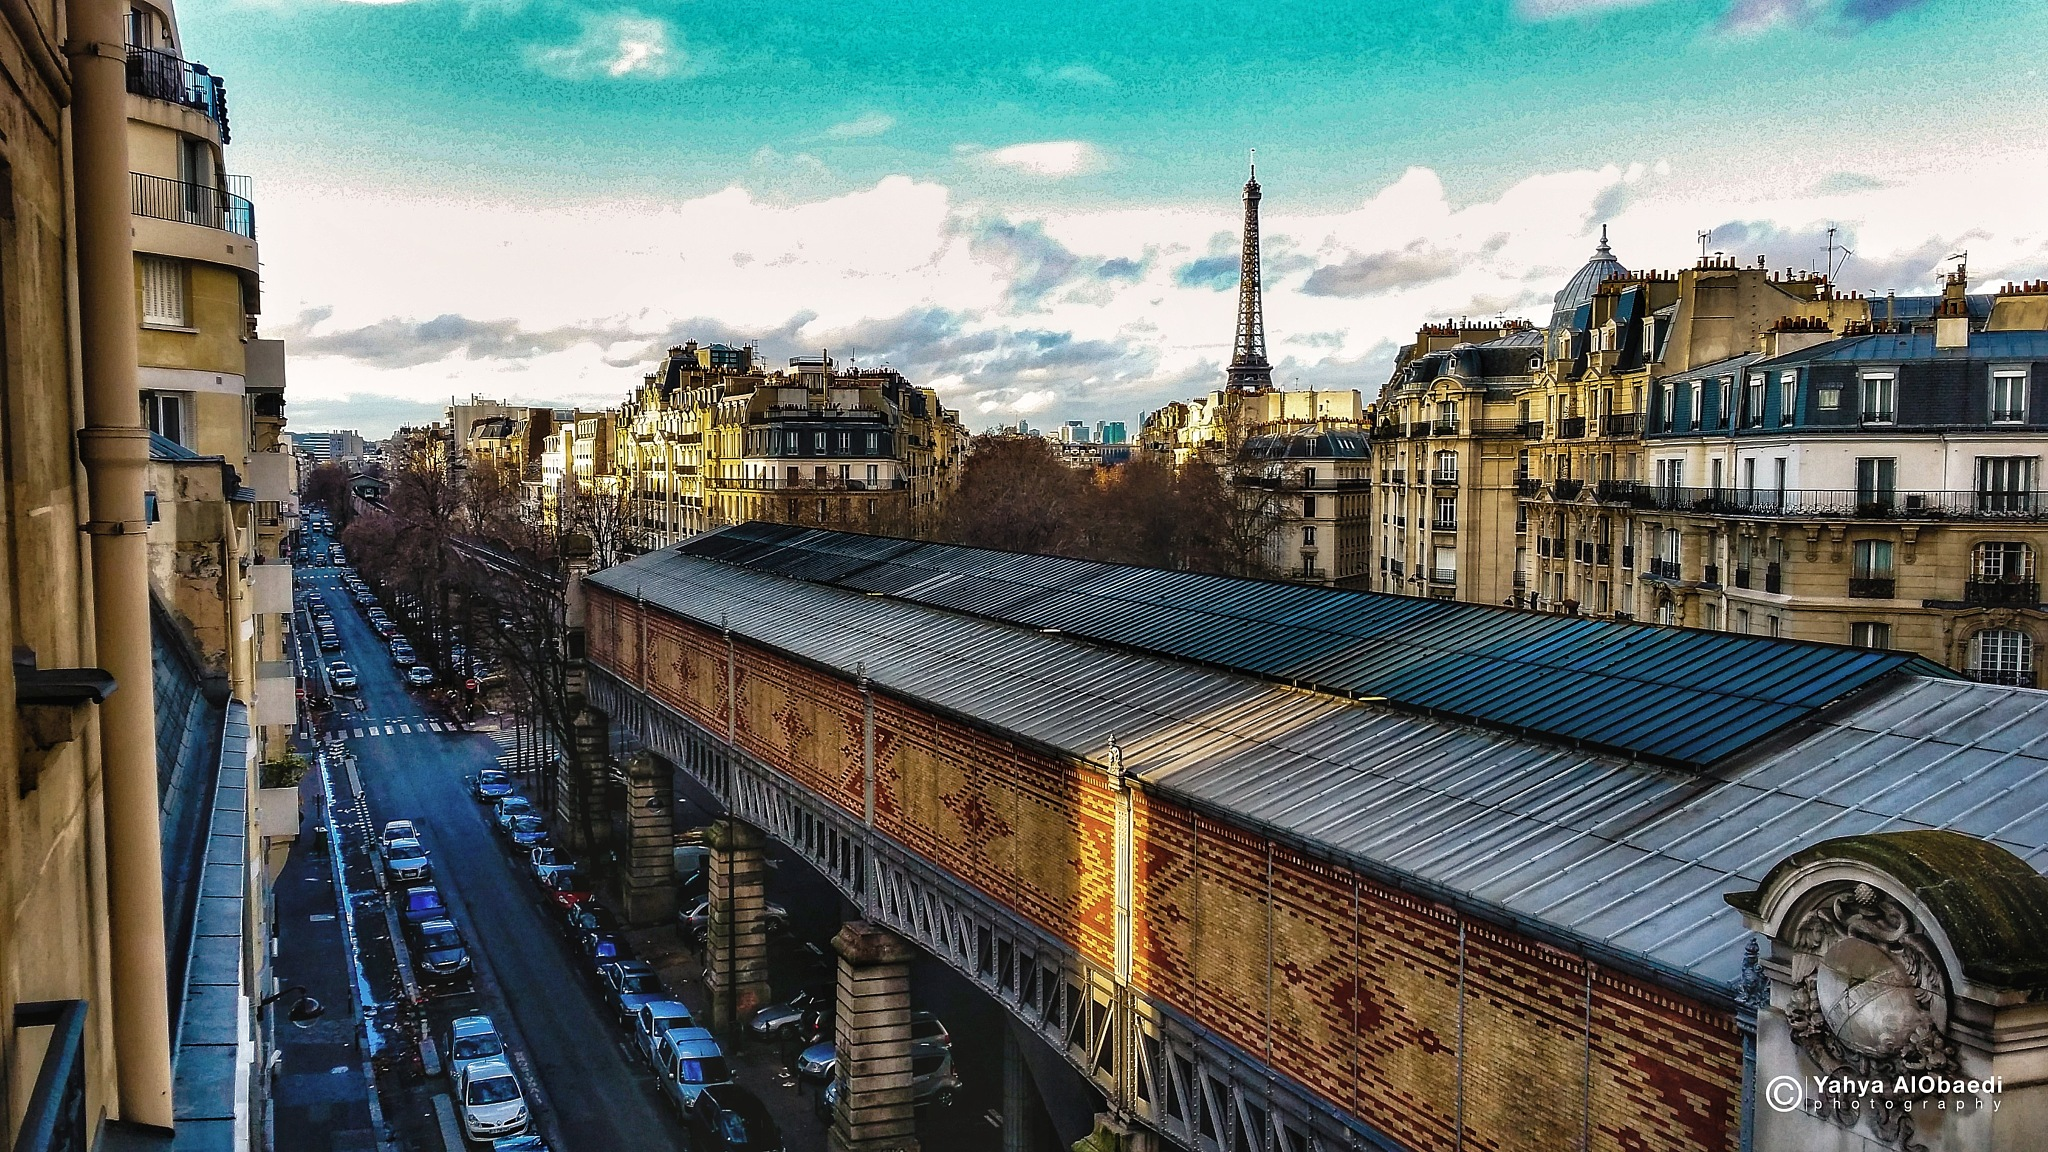 paris - metropolitan area by Yahya AlObaedi